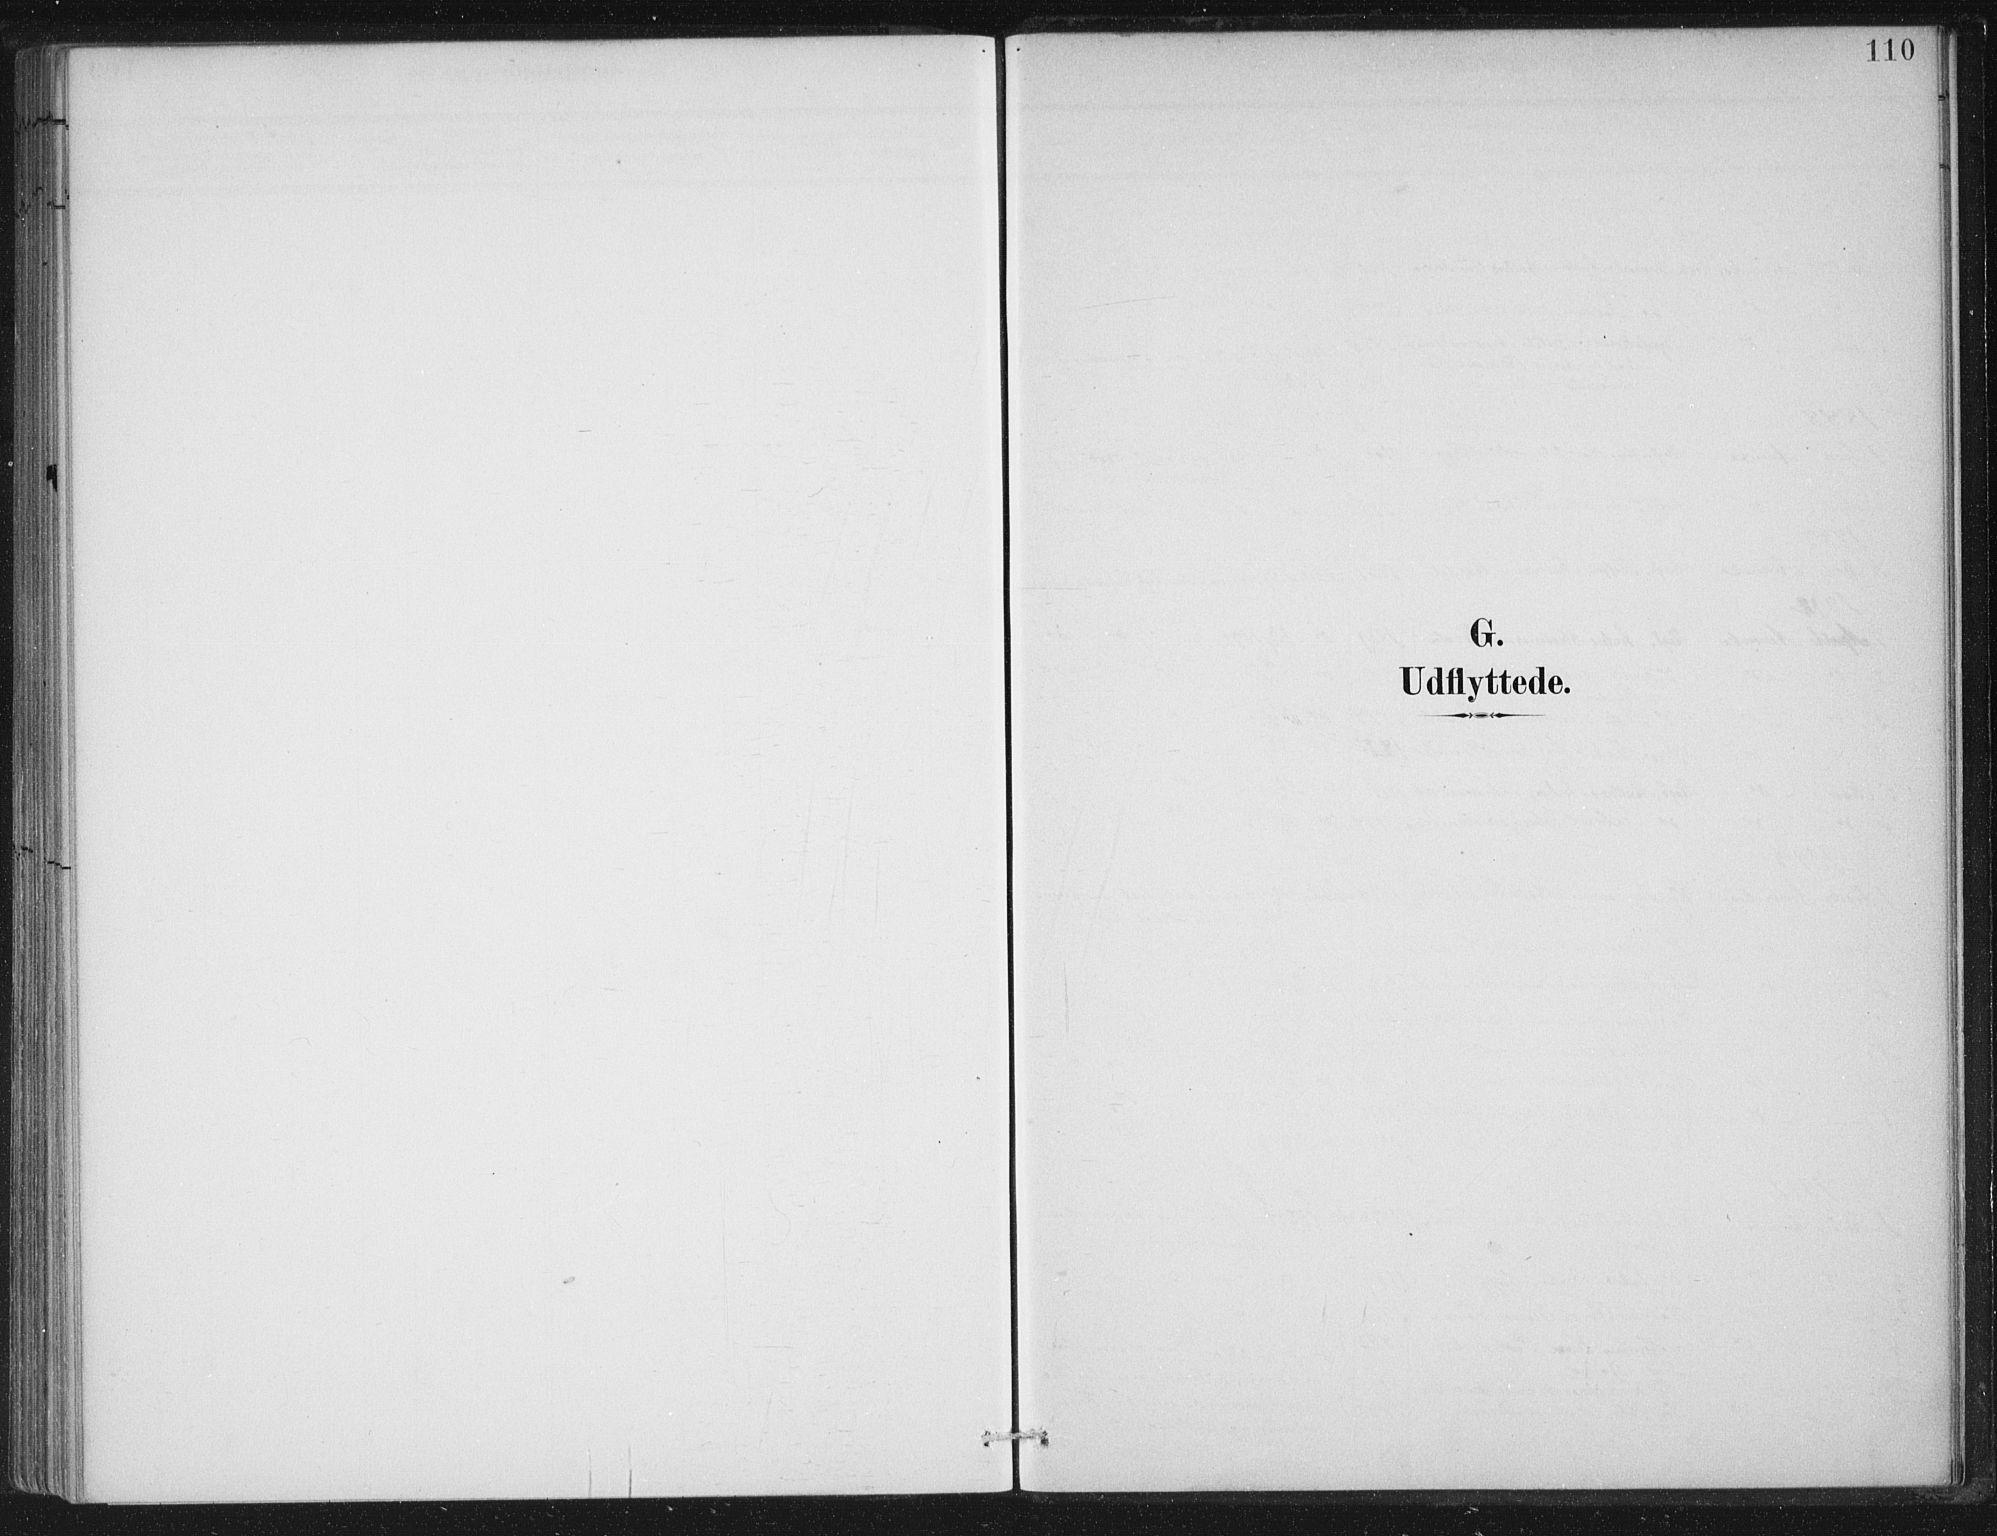 SAB, Gloppen sokneprestembete, H/Haa/Haad/L0001: Parish register (official) no. D  1, 1885-1910, p. 110